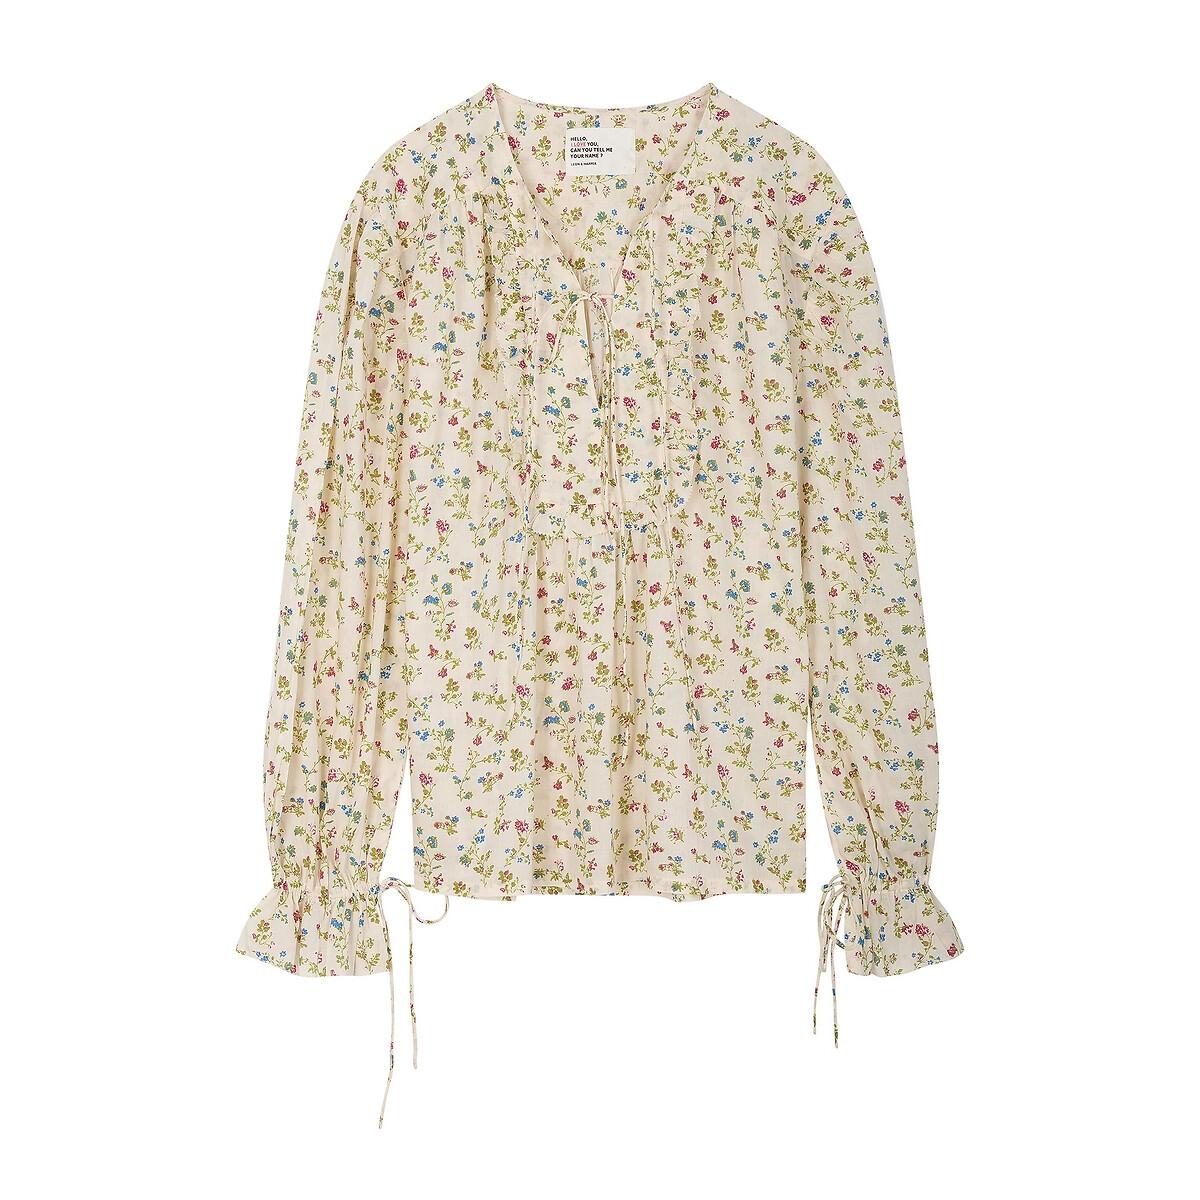 Блузка La Redoute С принтом из биохлопка CHOUPETTE XS бежевый блузка lime блузка с завязками